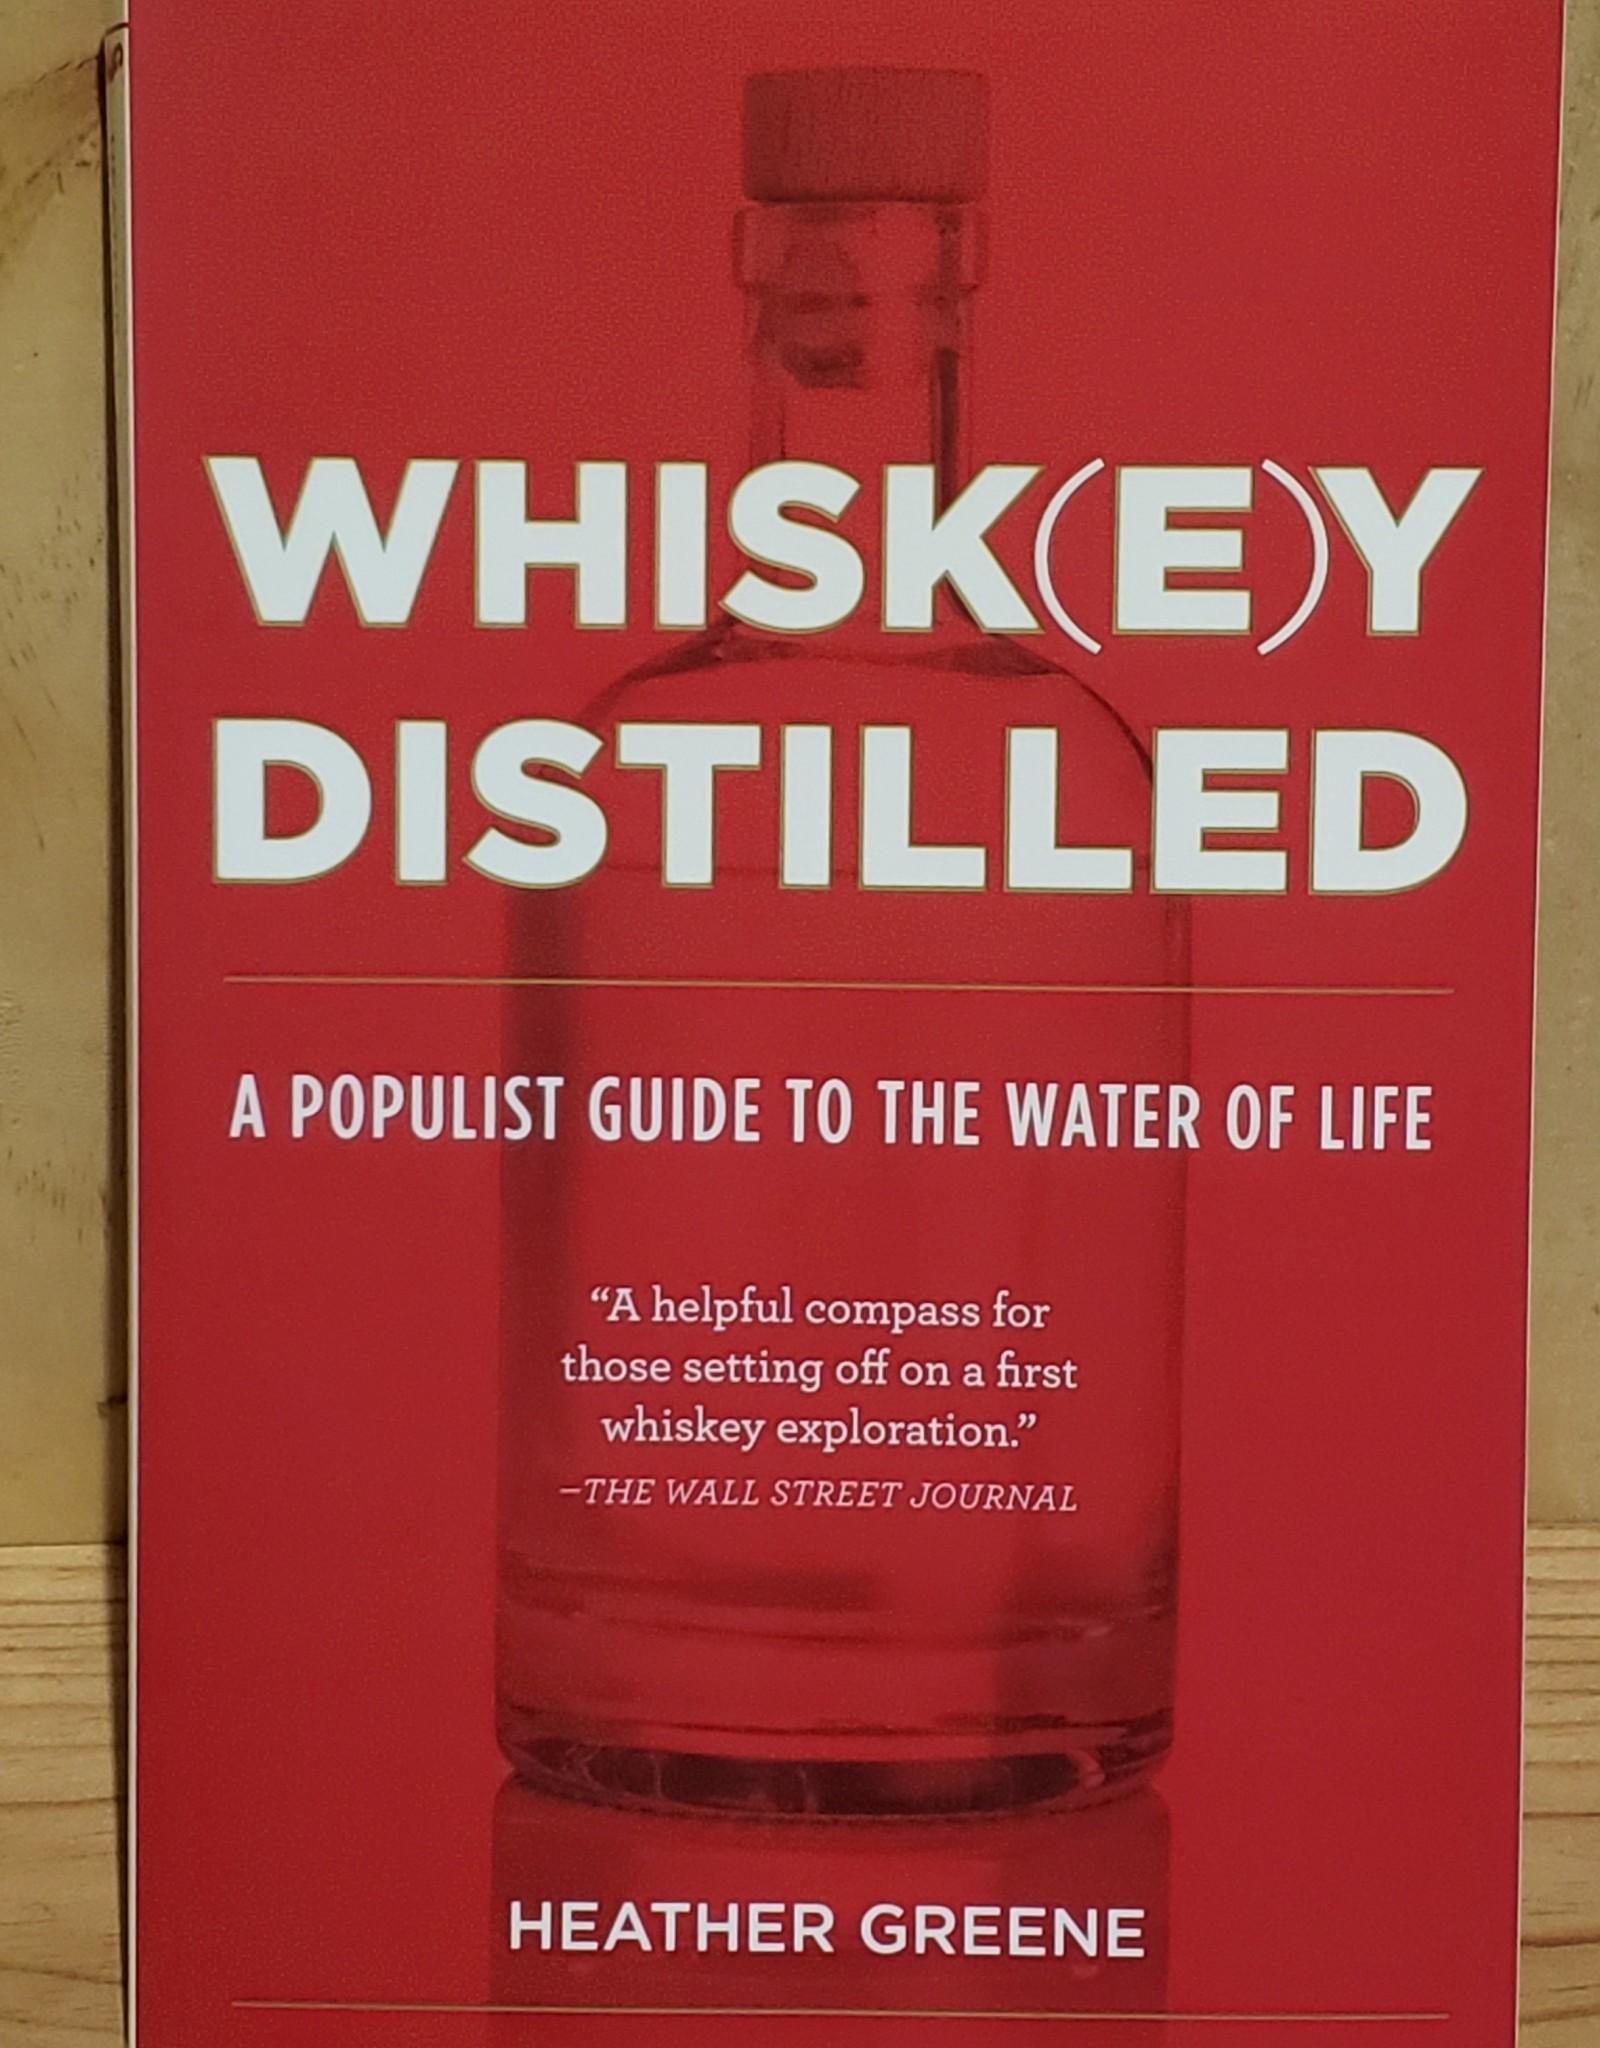 Books, Whiskey Distilled